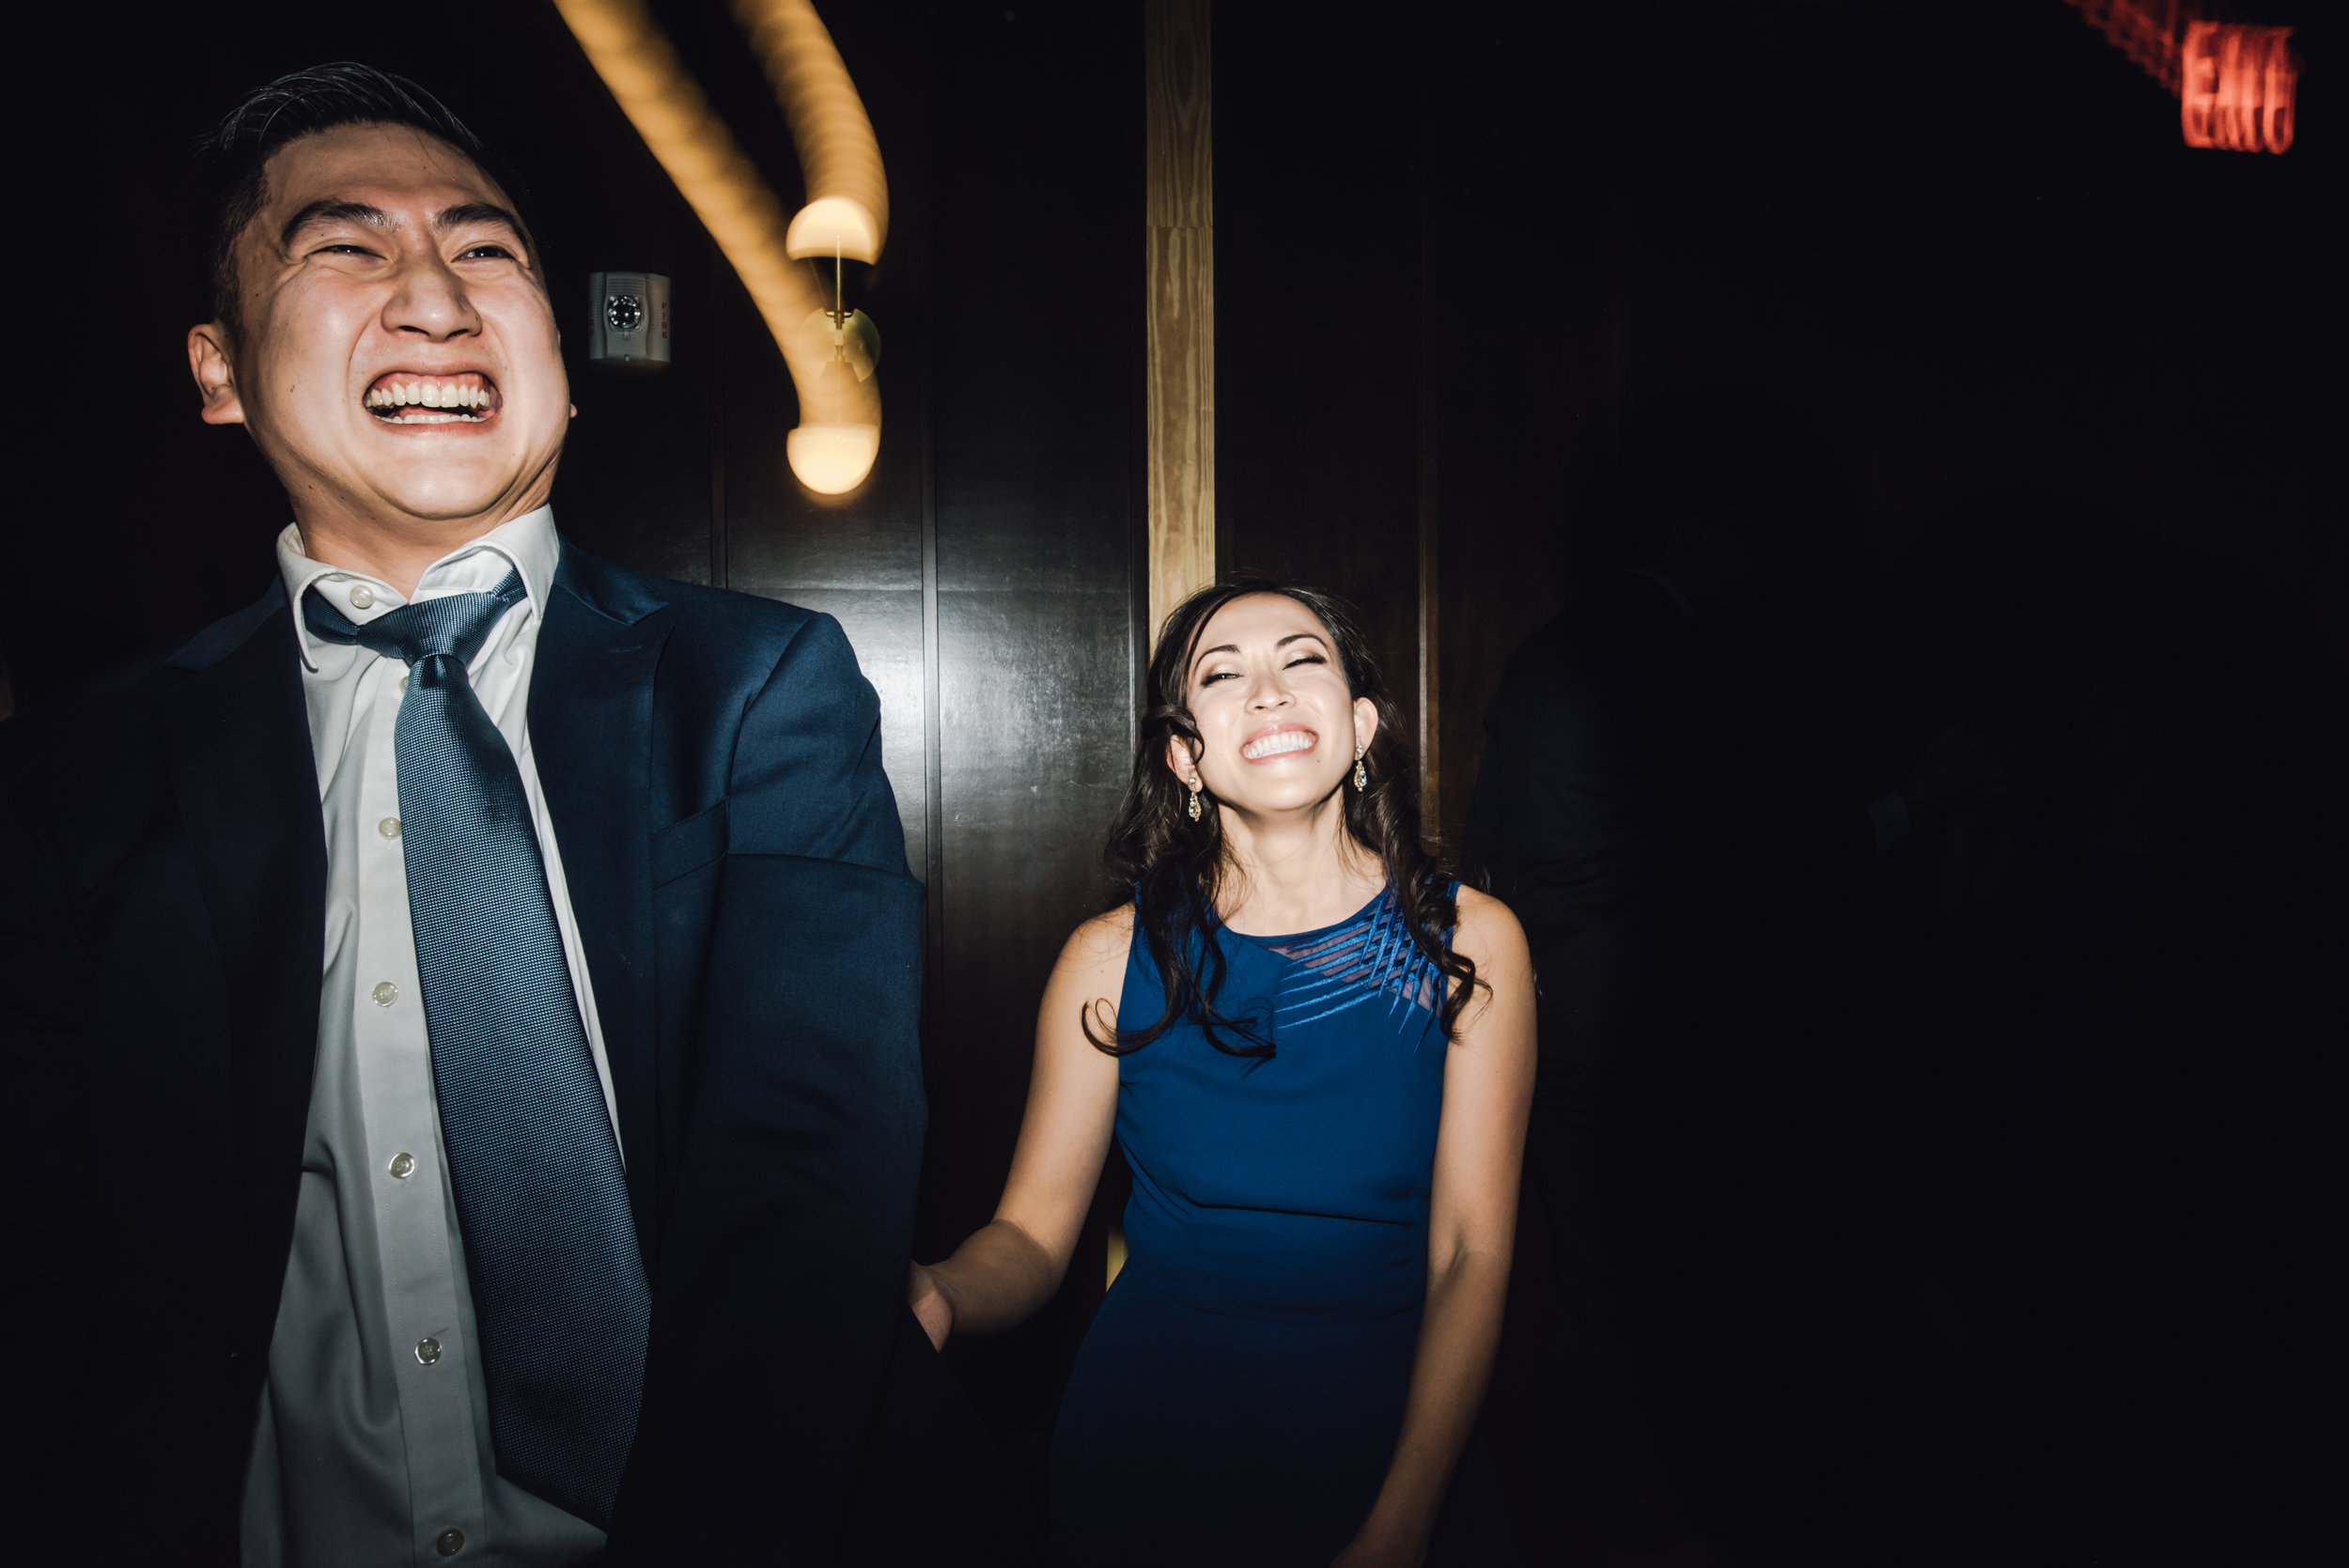 Main and Simple Photography_2018_Weddings_DC_K+T-1844.jpg